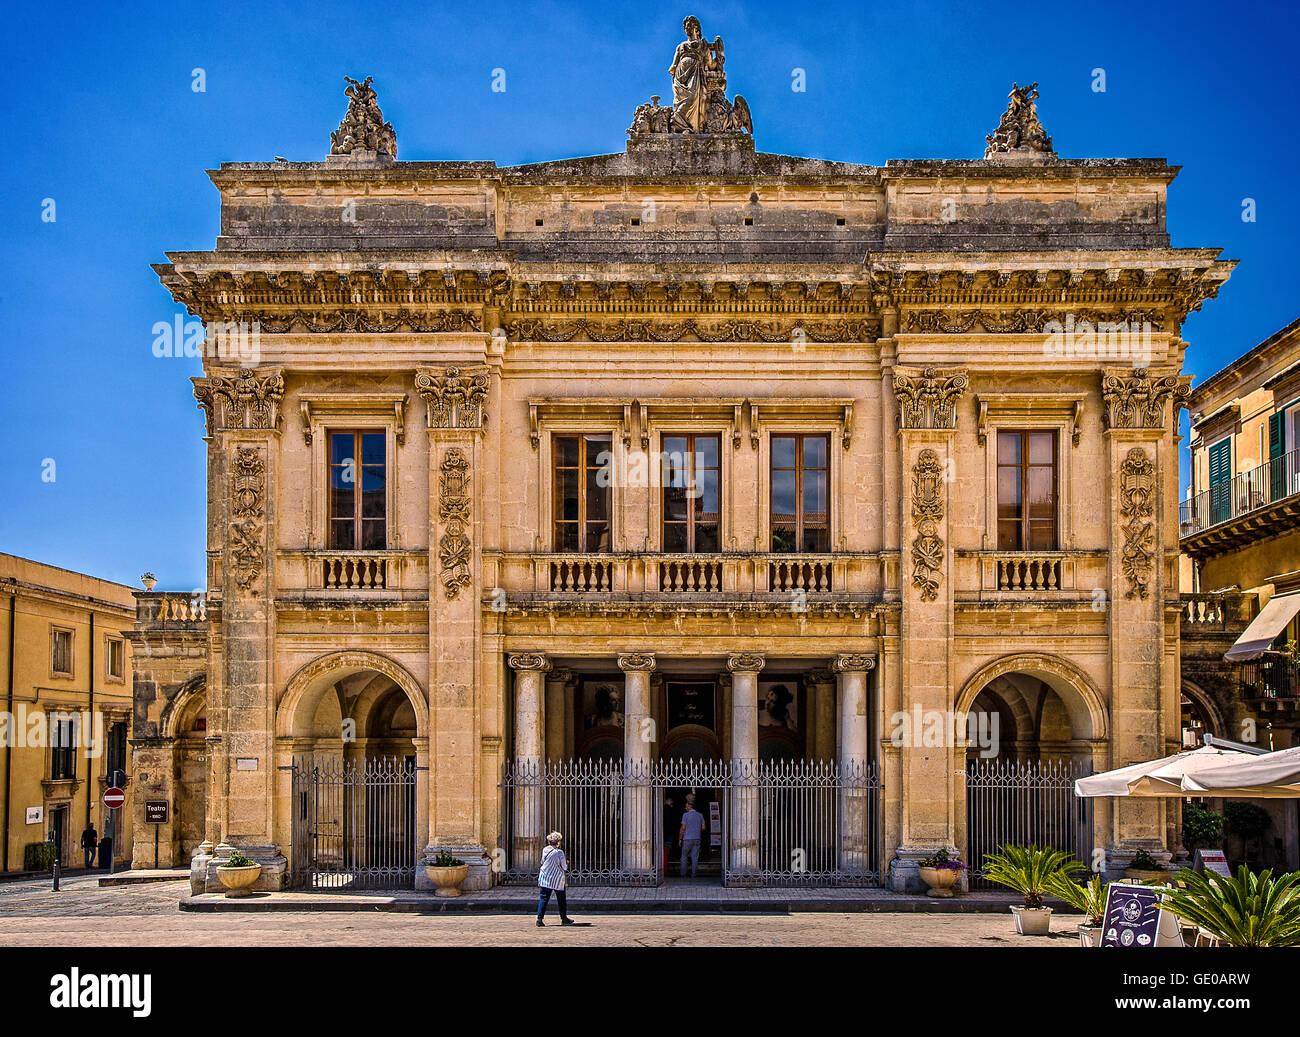 Italy Sicily Noto Tina di Lorenzo Theater - Stock Image